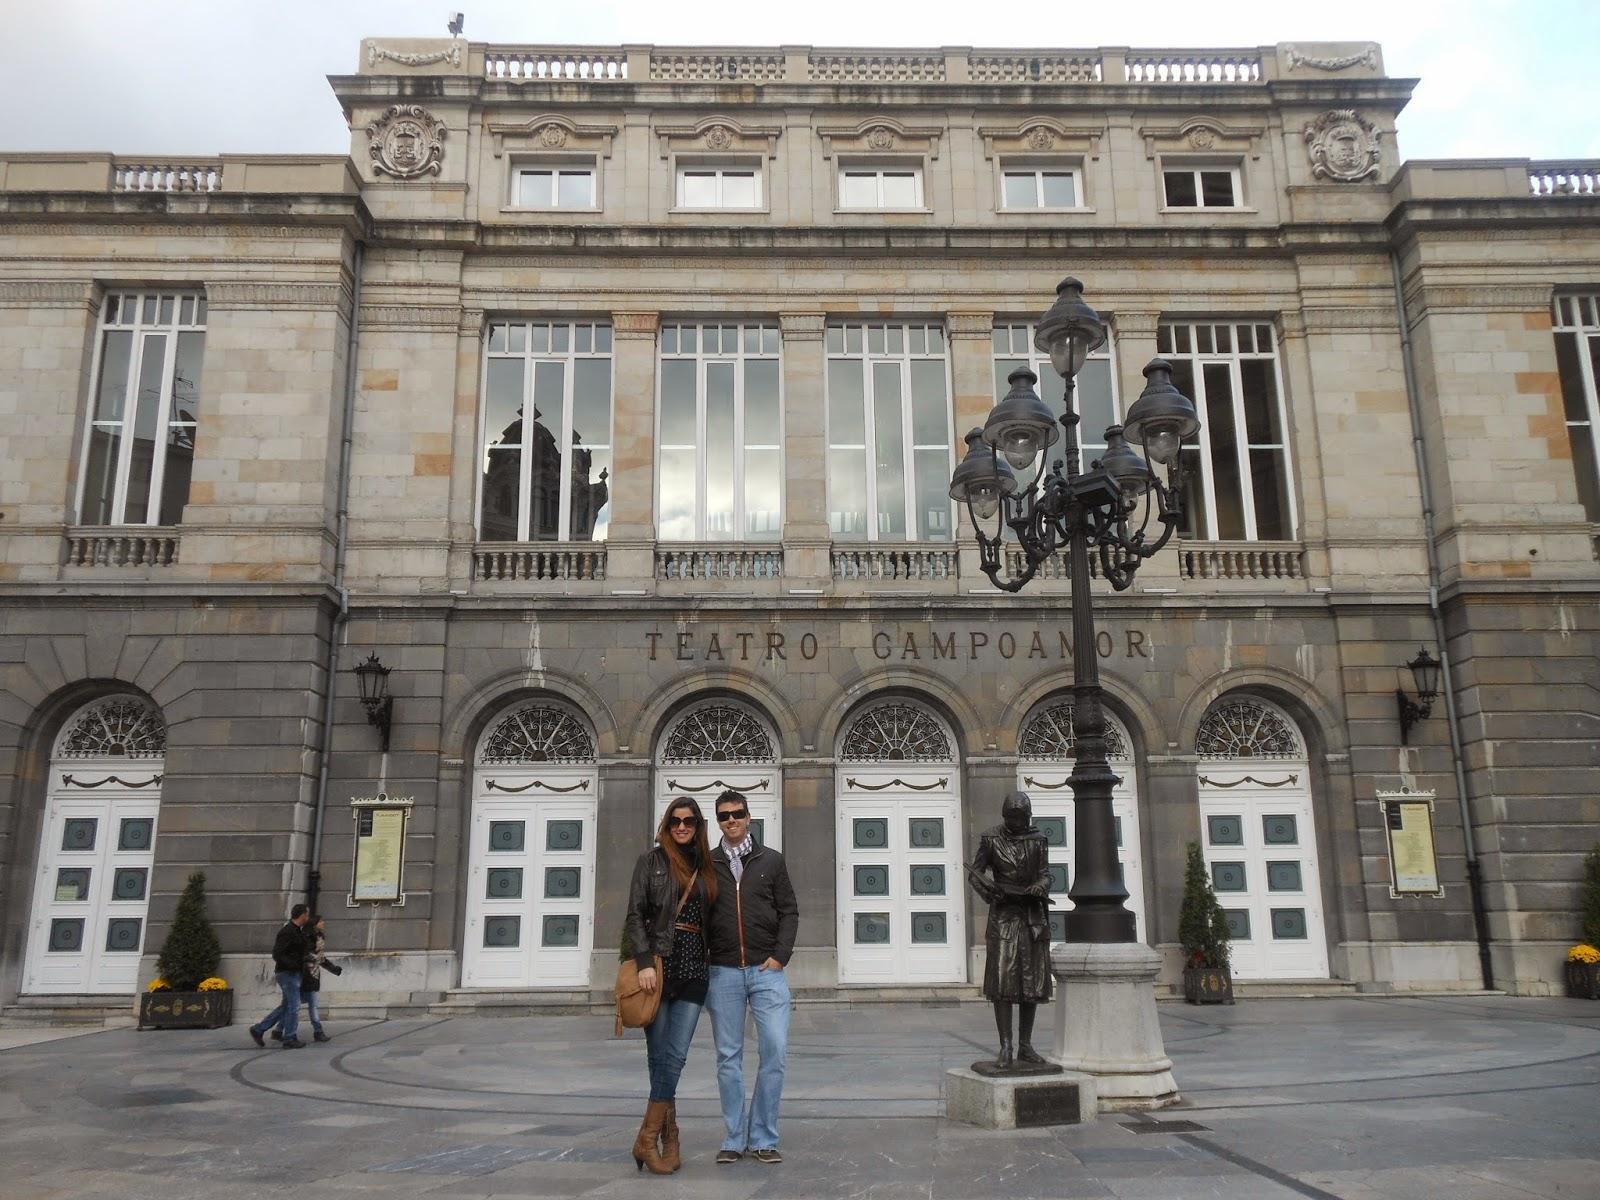 Oviedo Campoamor